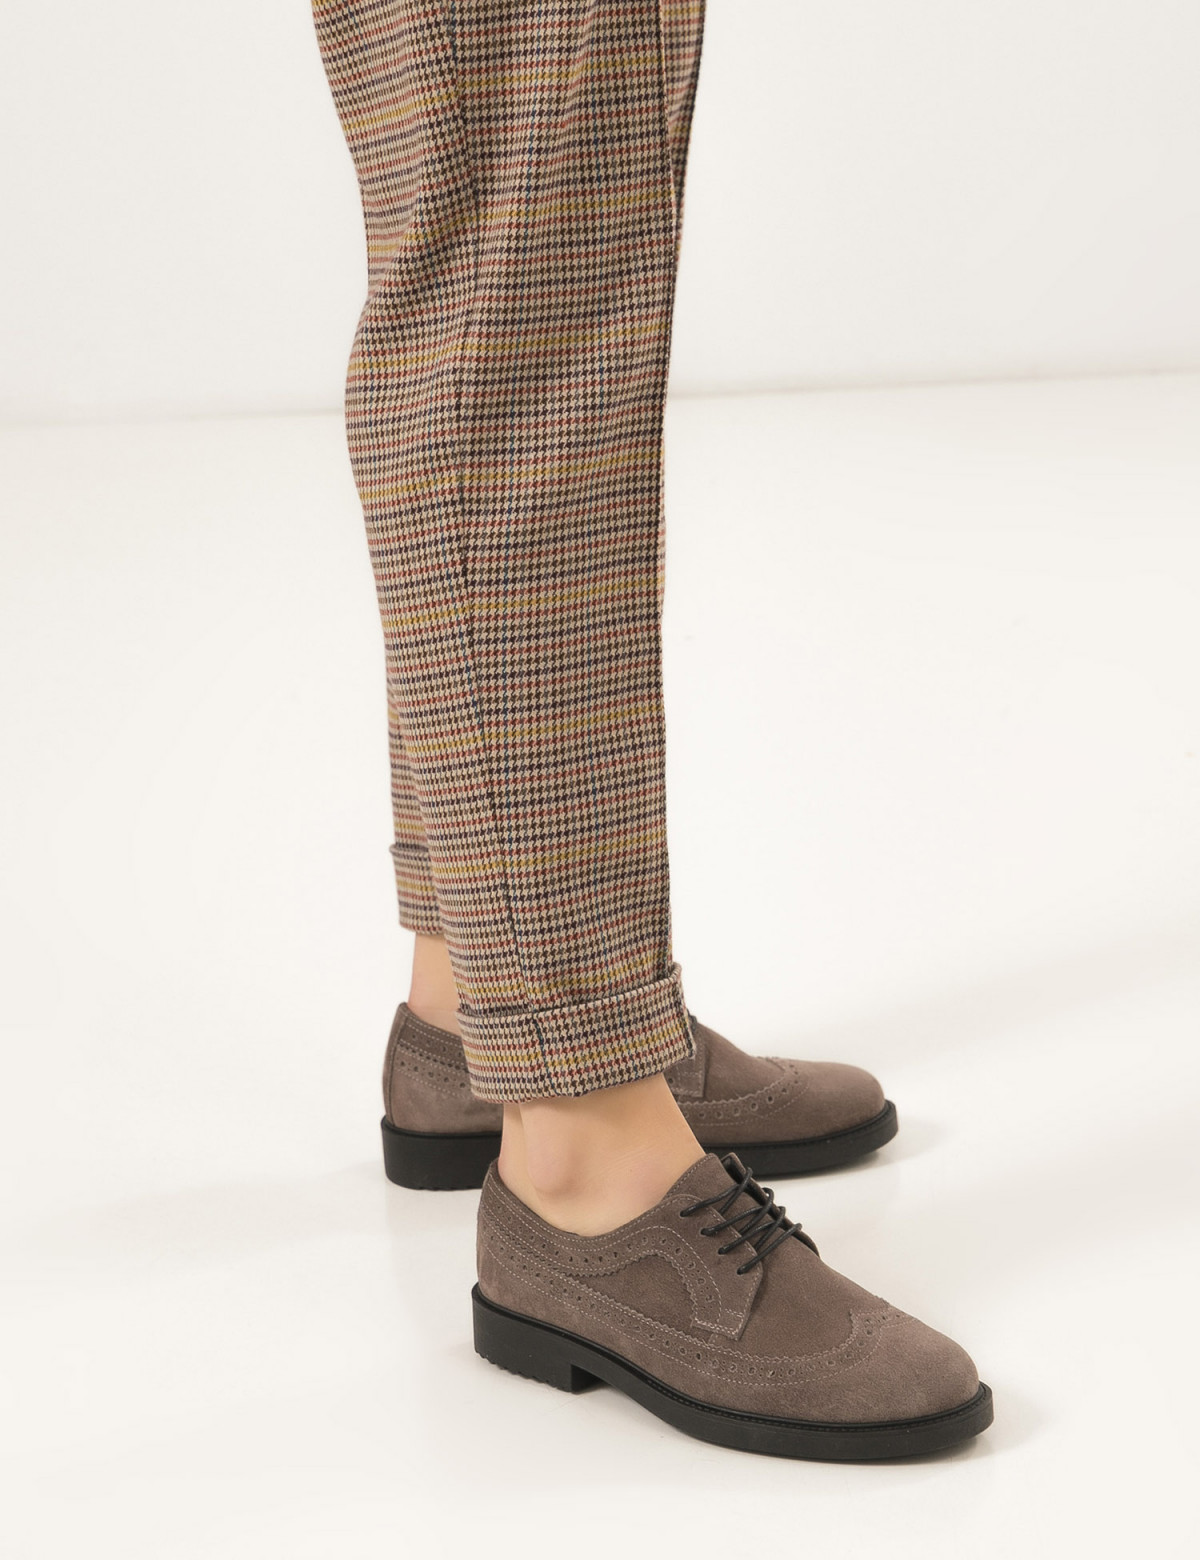 Туфлі темно-бежеві, натуральна замша5